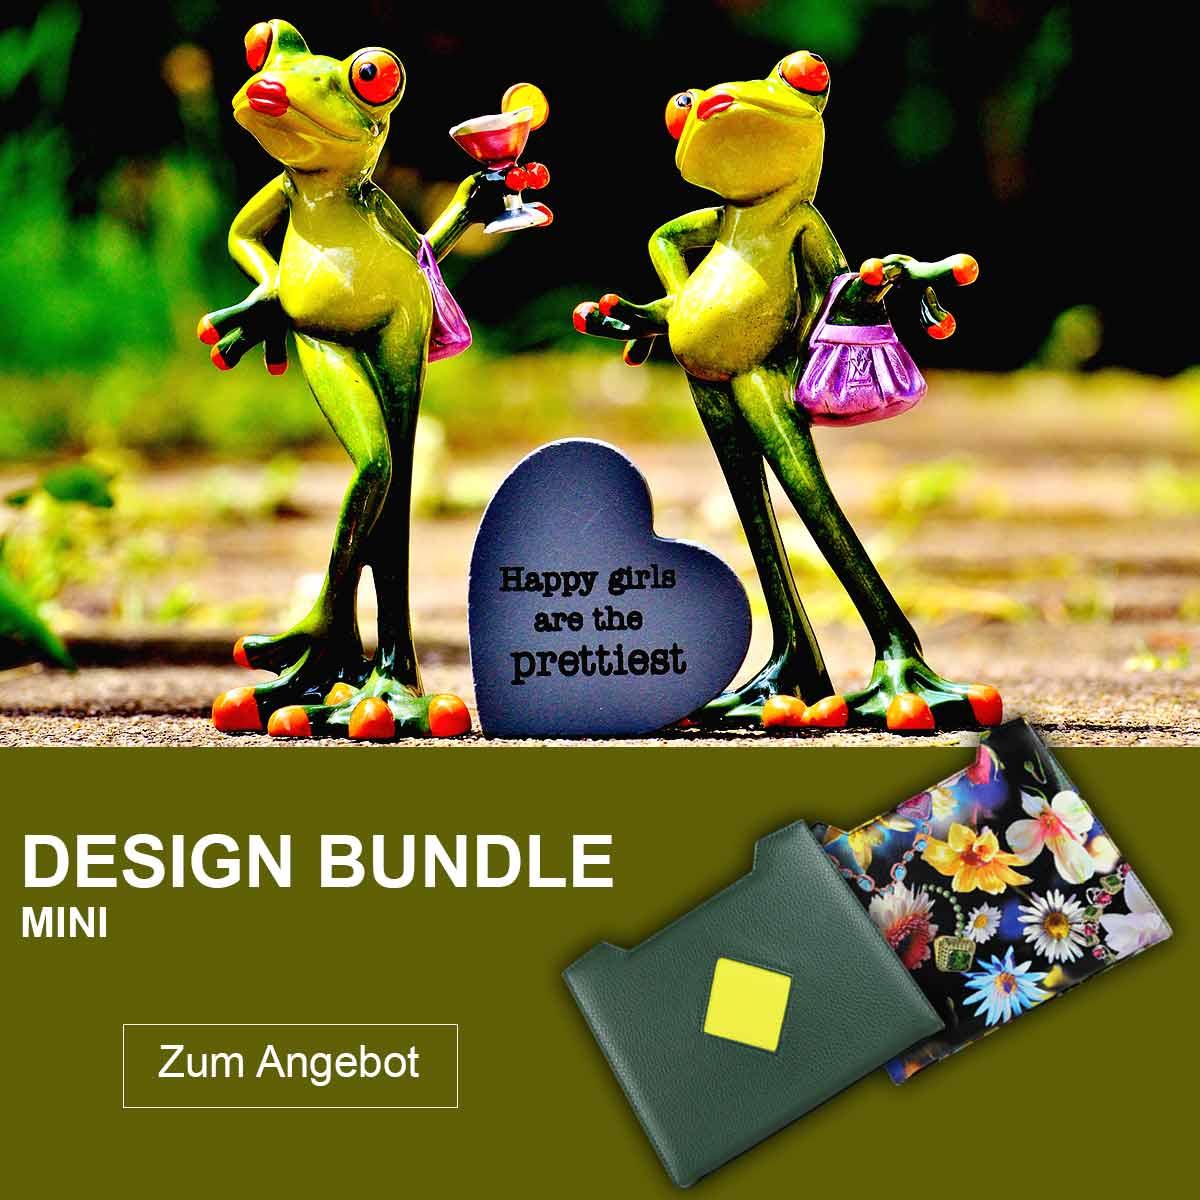 Design Bundle mini  September